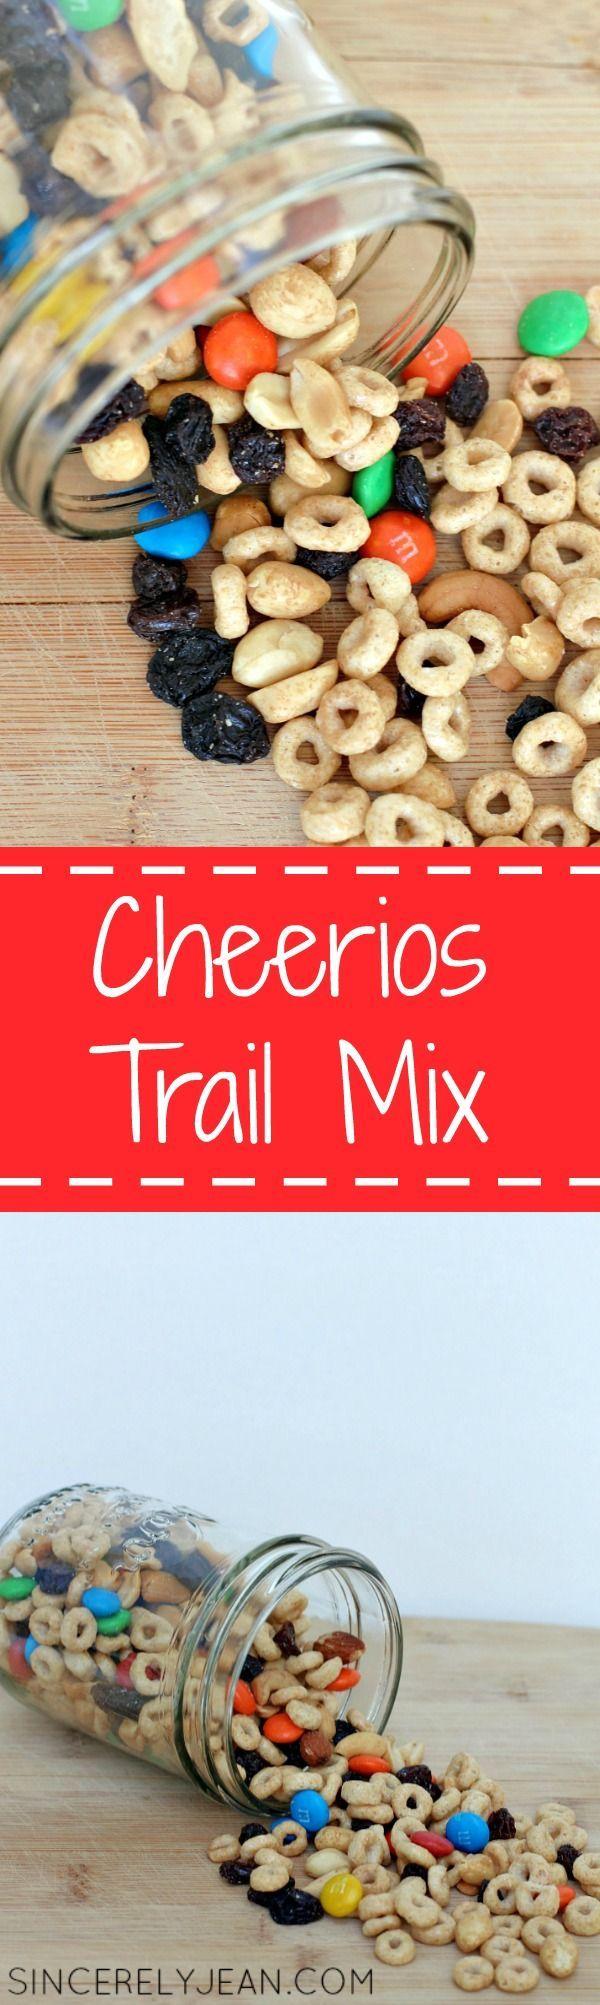 Cheerios Trail Mix - Yummy and easy summer snack! | www.sincerelyjean.com #summerofcheerios